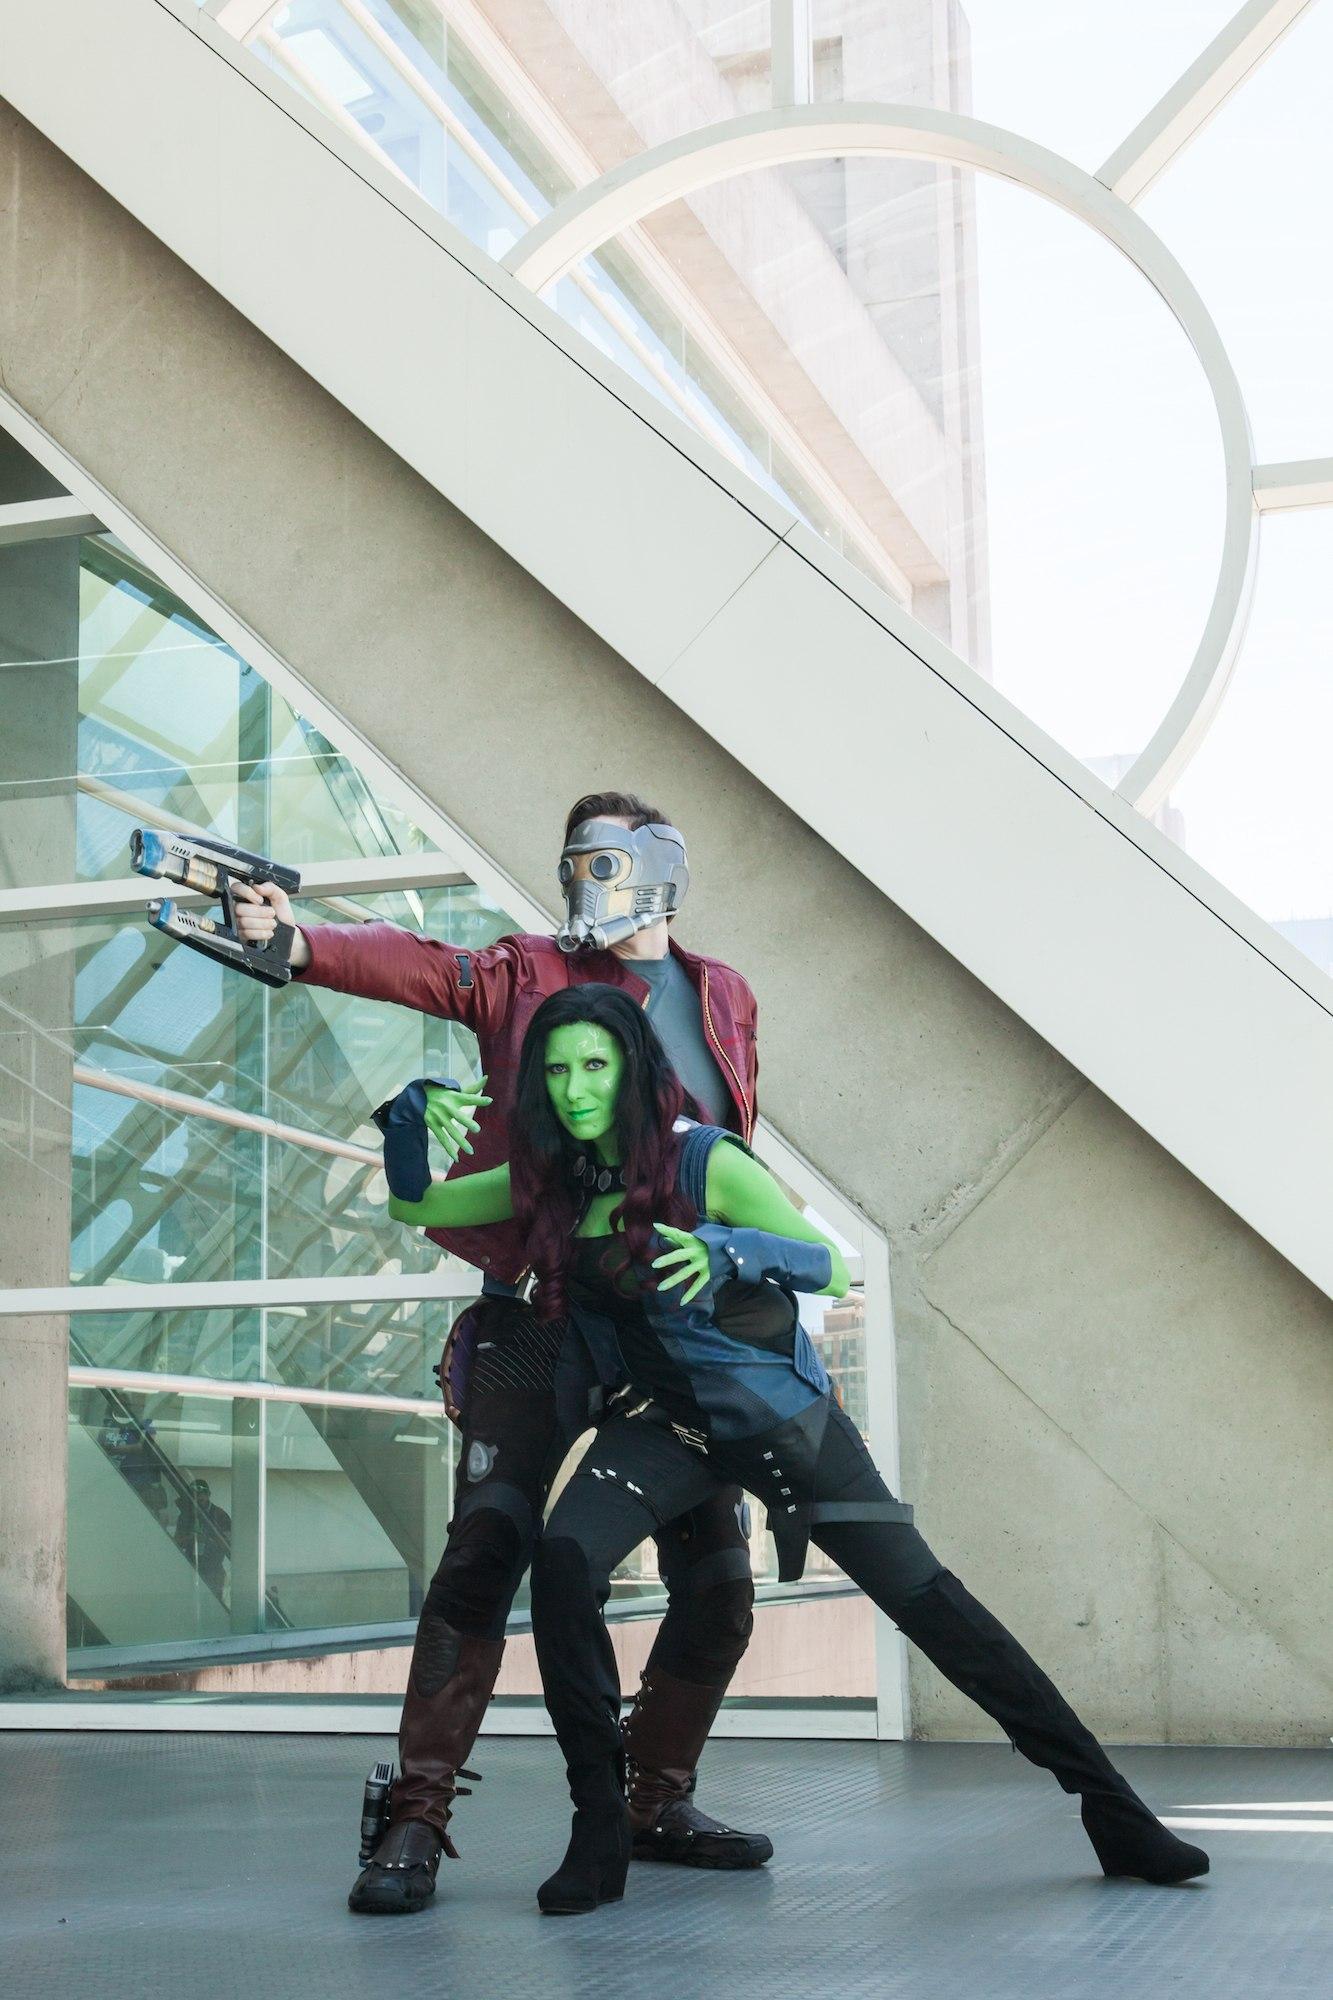 Pasangan kaukasia dengan cosplay kostum dan gaya rambut Gamora Guardians of the Galaxy